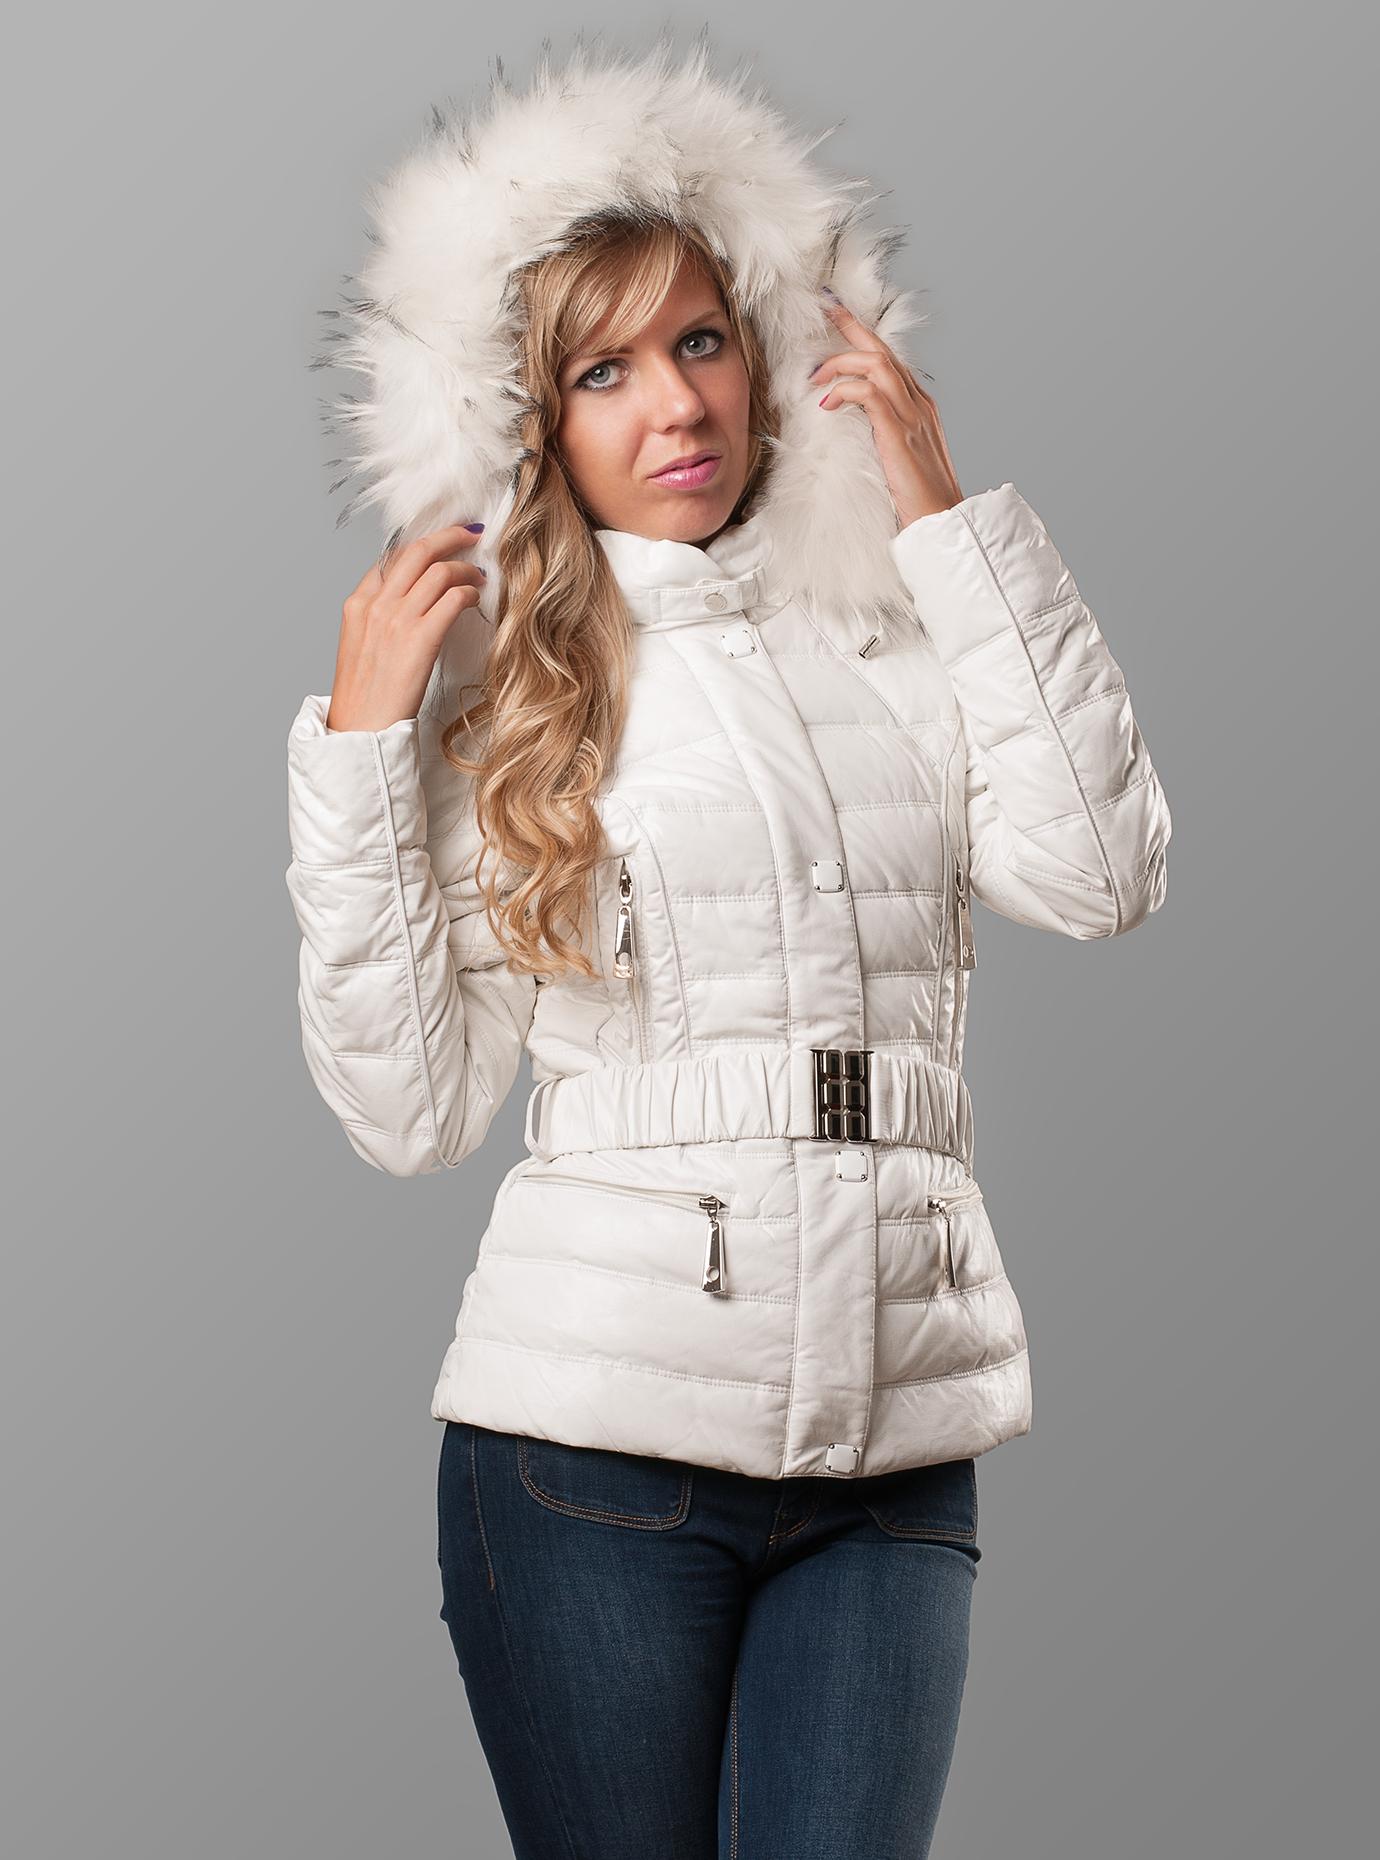 Пуховик зимний женский Белый S (01-RR16068): фото - Alster.ua